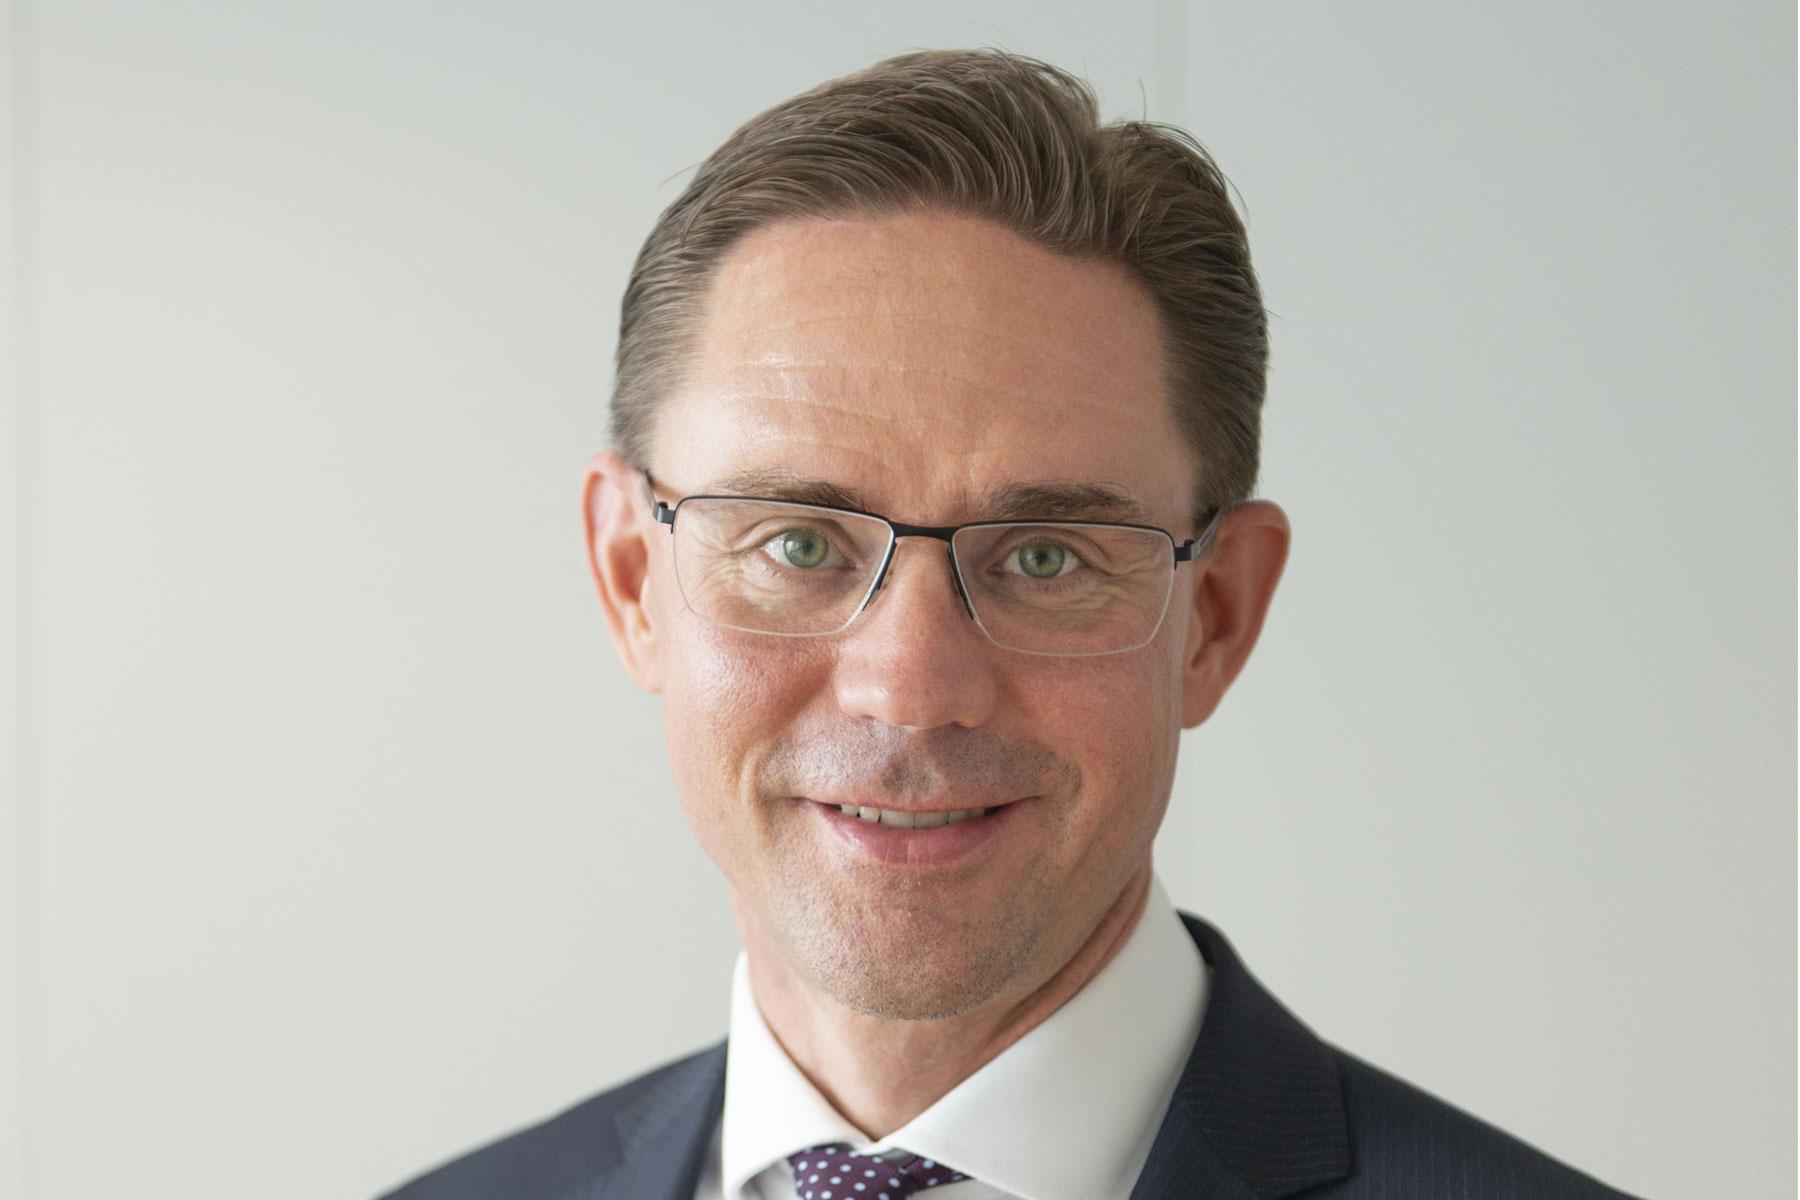 Jyrki Katainen | Vice-President, European Commission